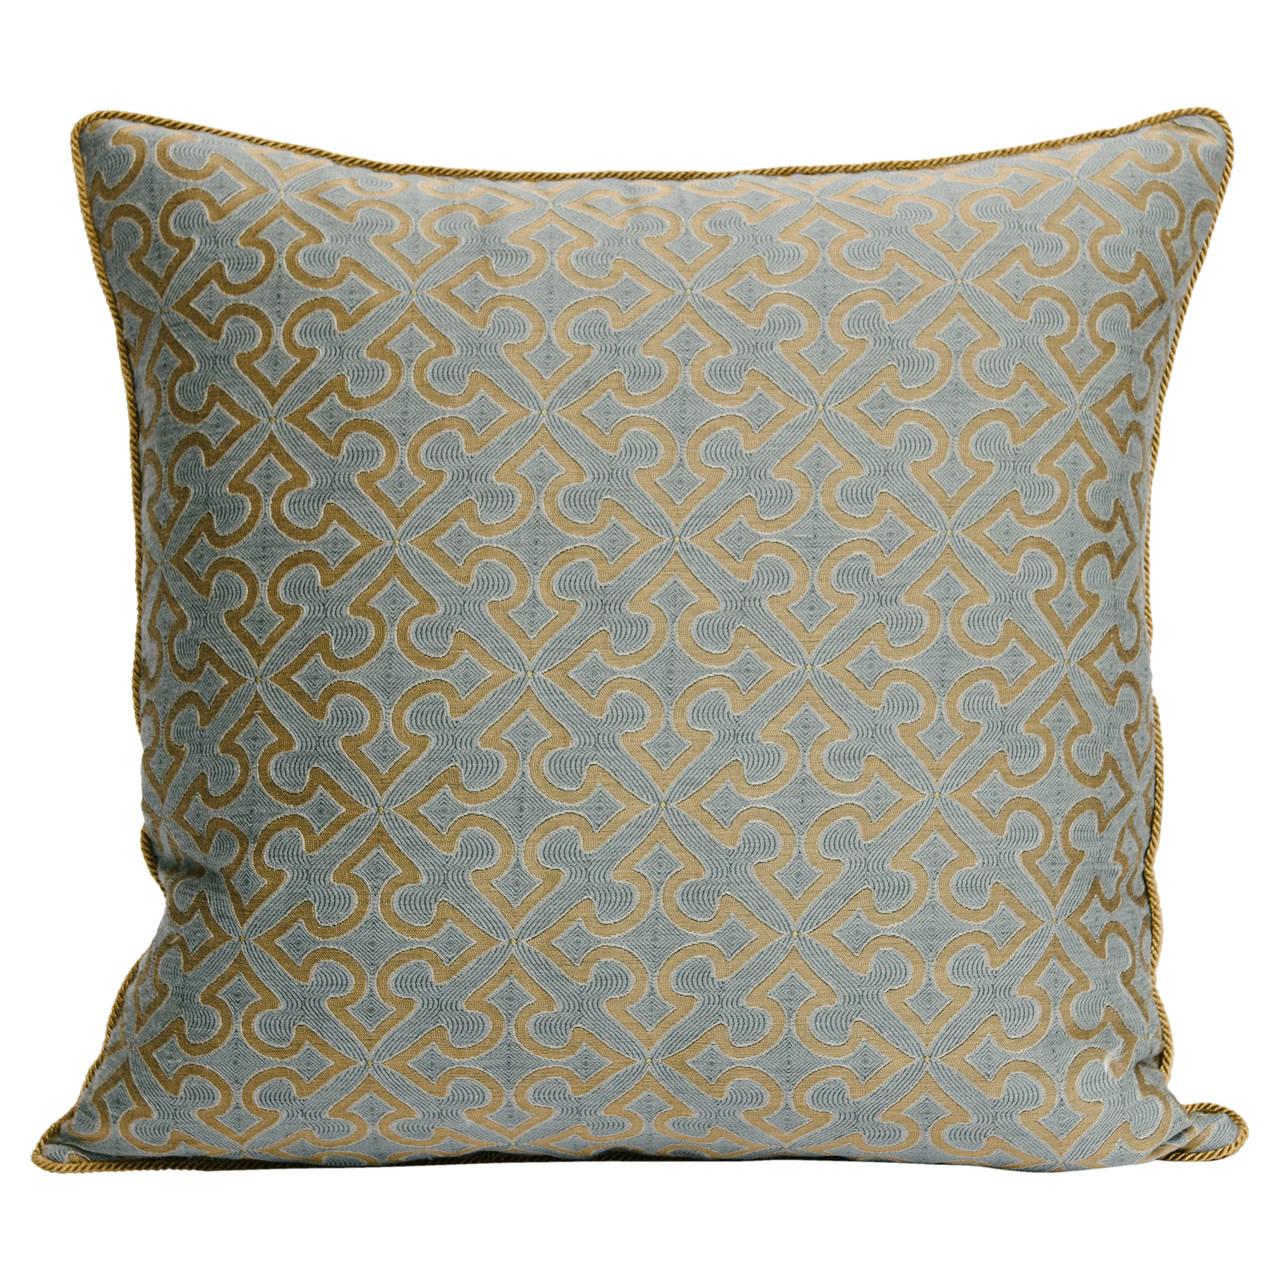 Custom Romanesque Patterned Pillow, 2015